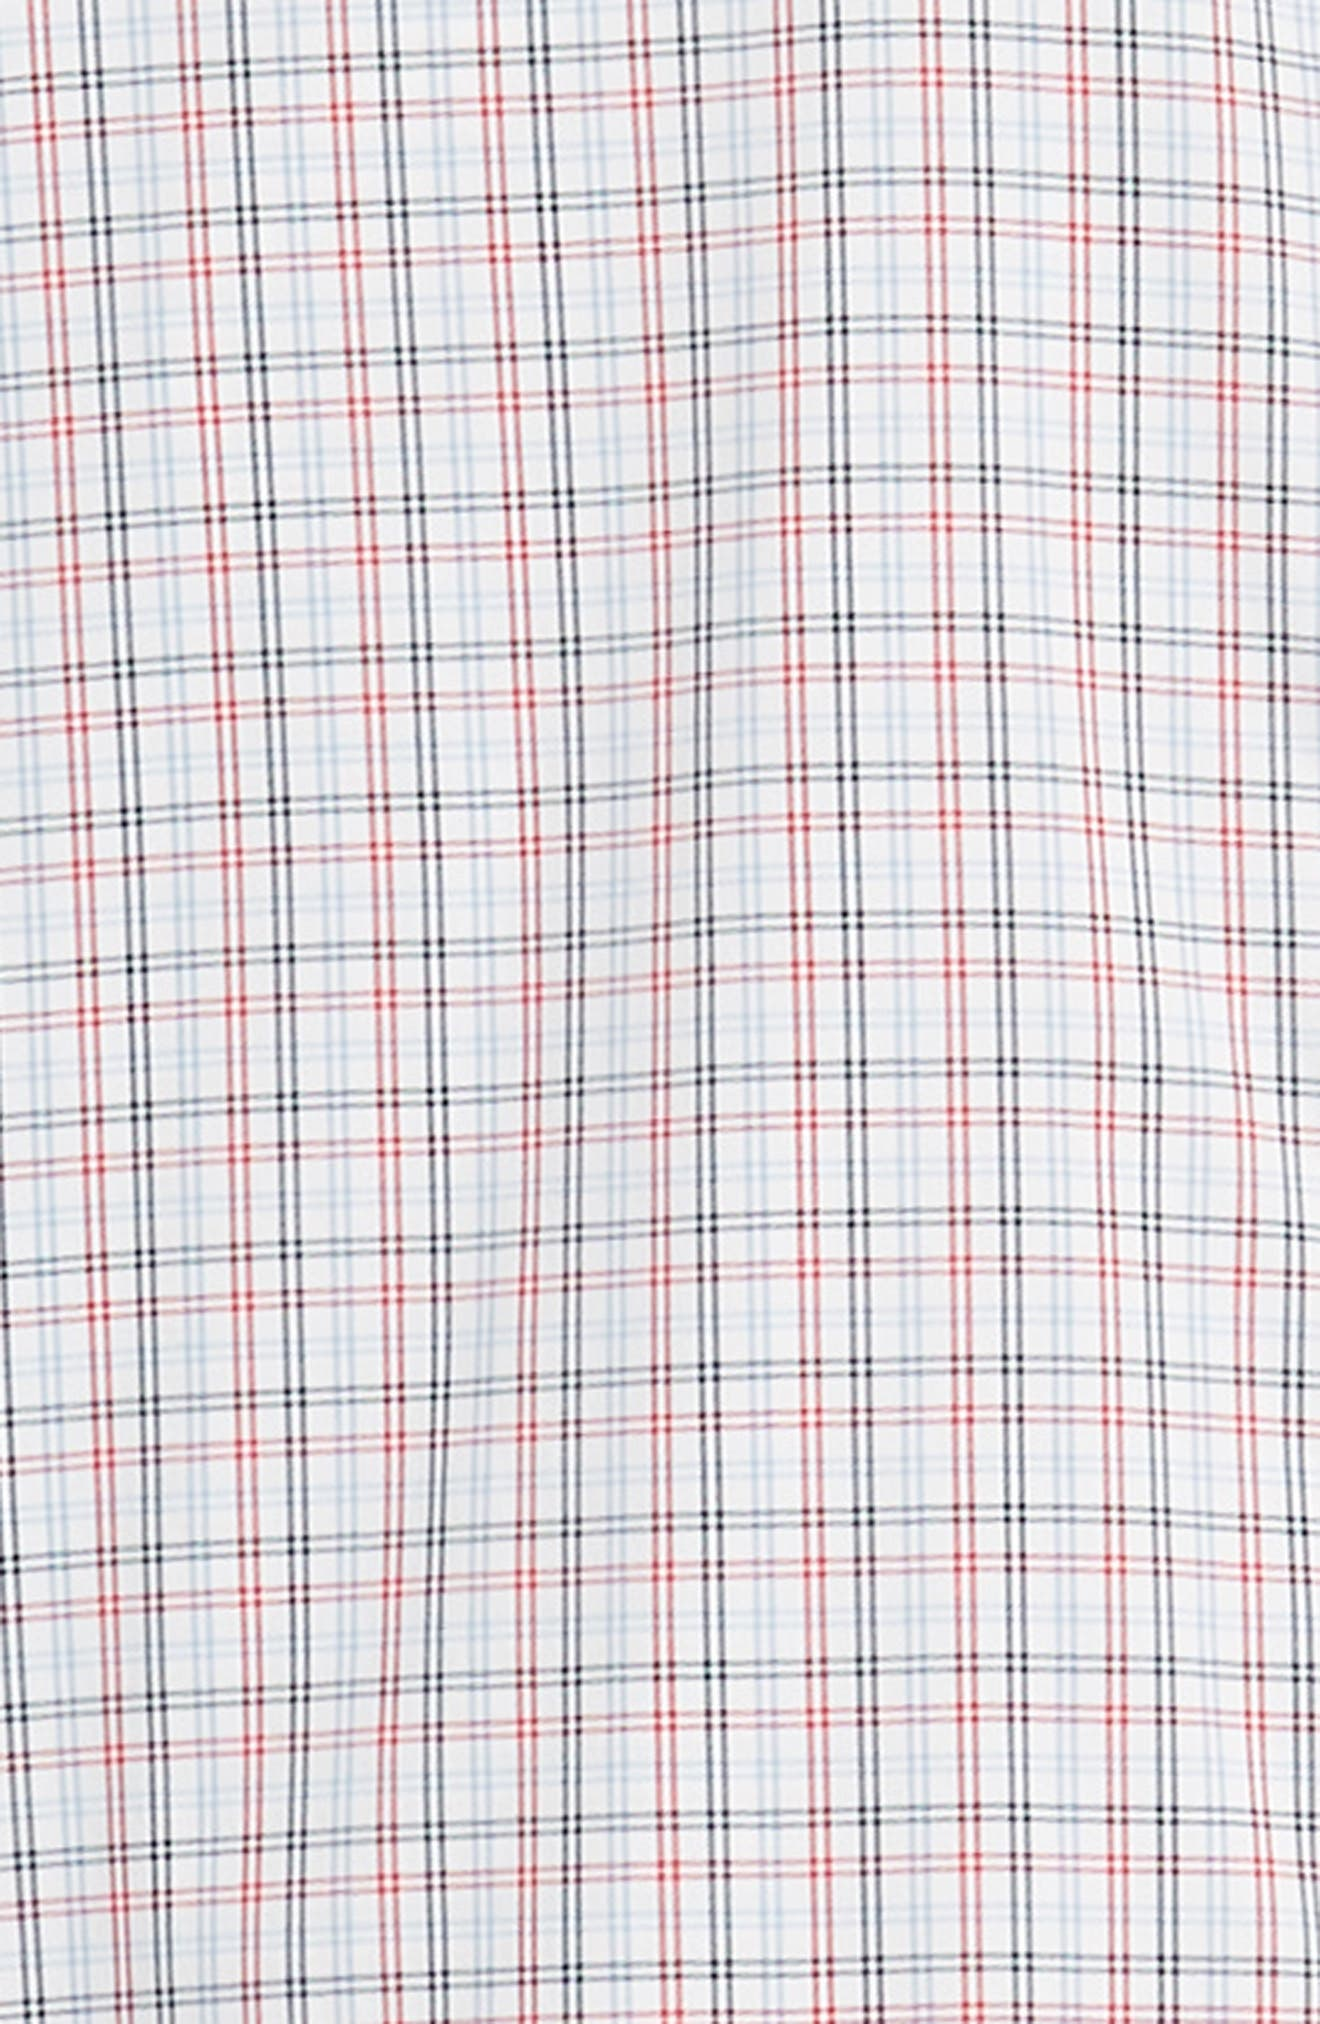 Slim Fit Check Performance Sport Shirt,                             Alternate thumbnail 6, color,                             HILLGROVE CHECK - CERISE